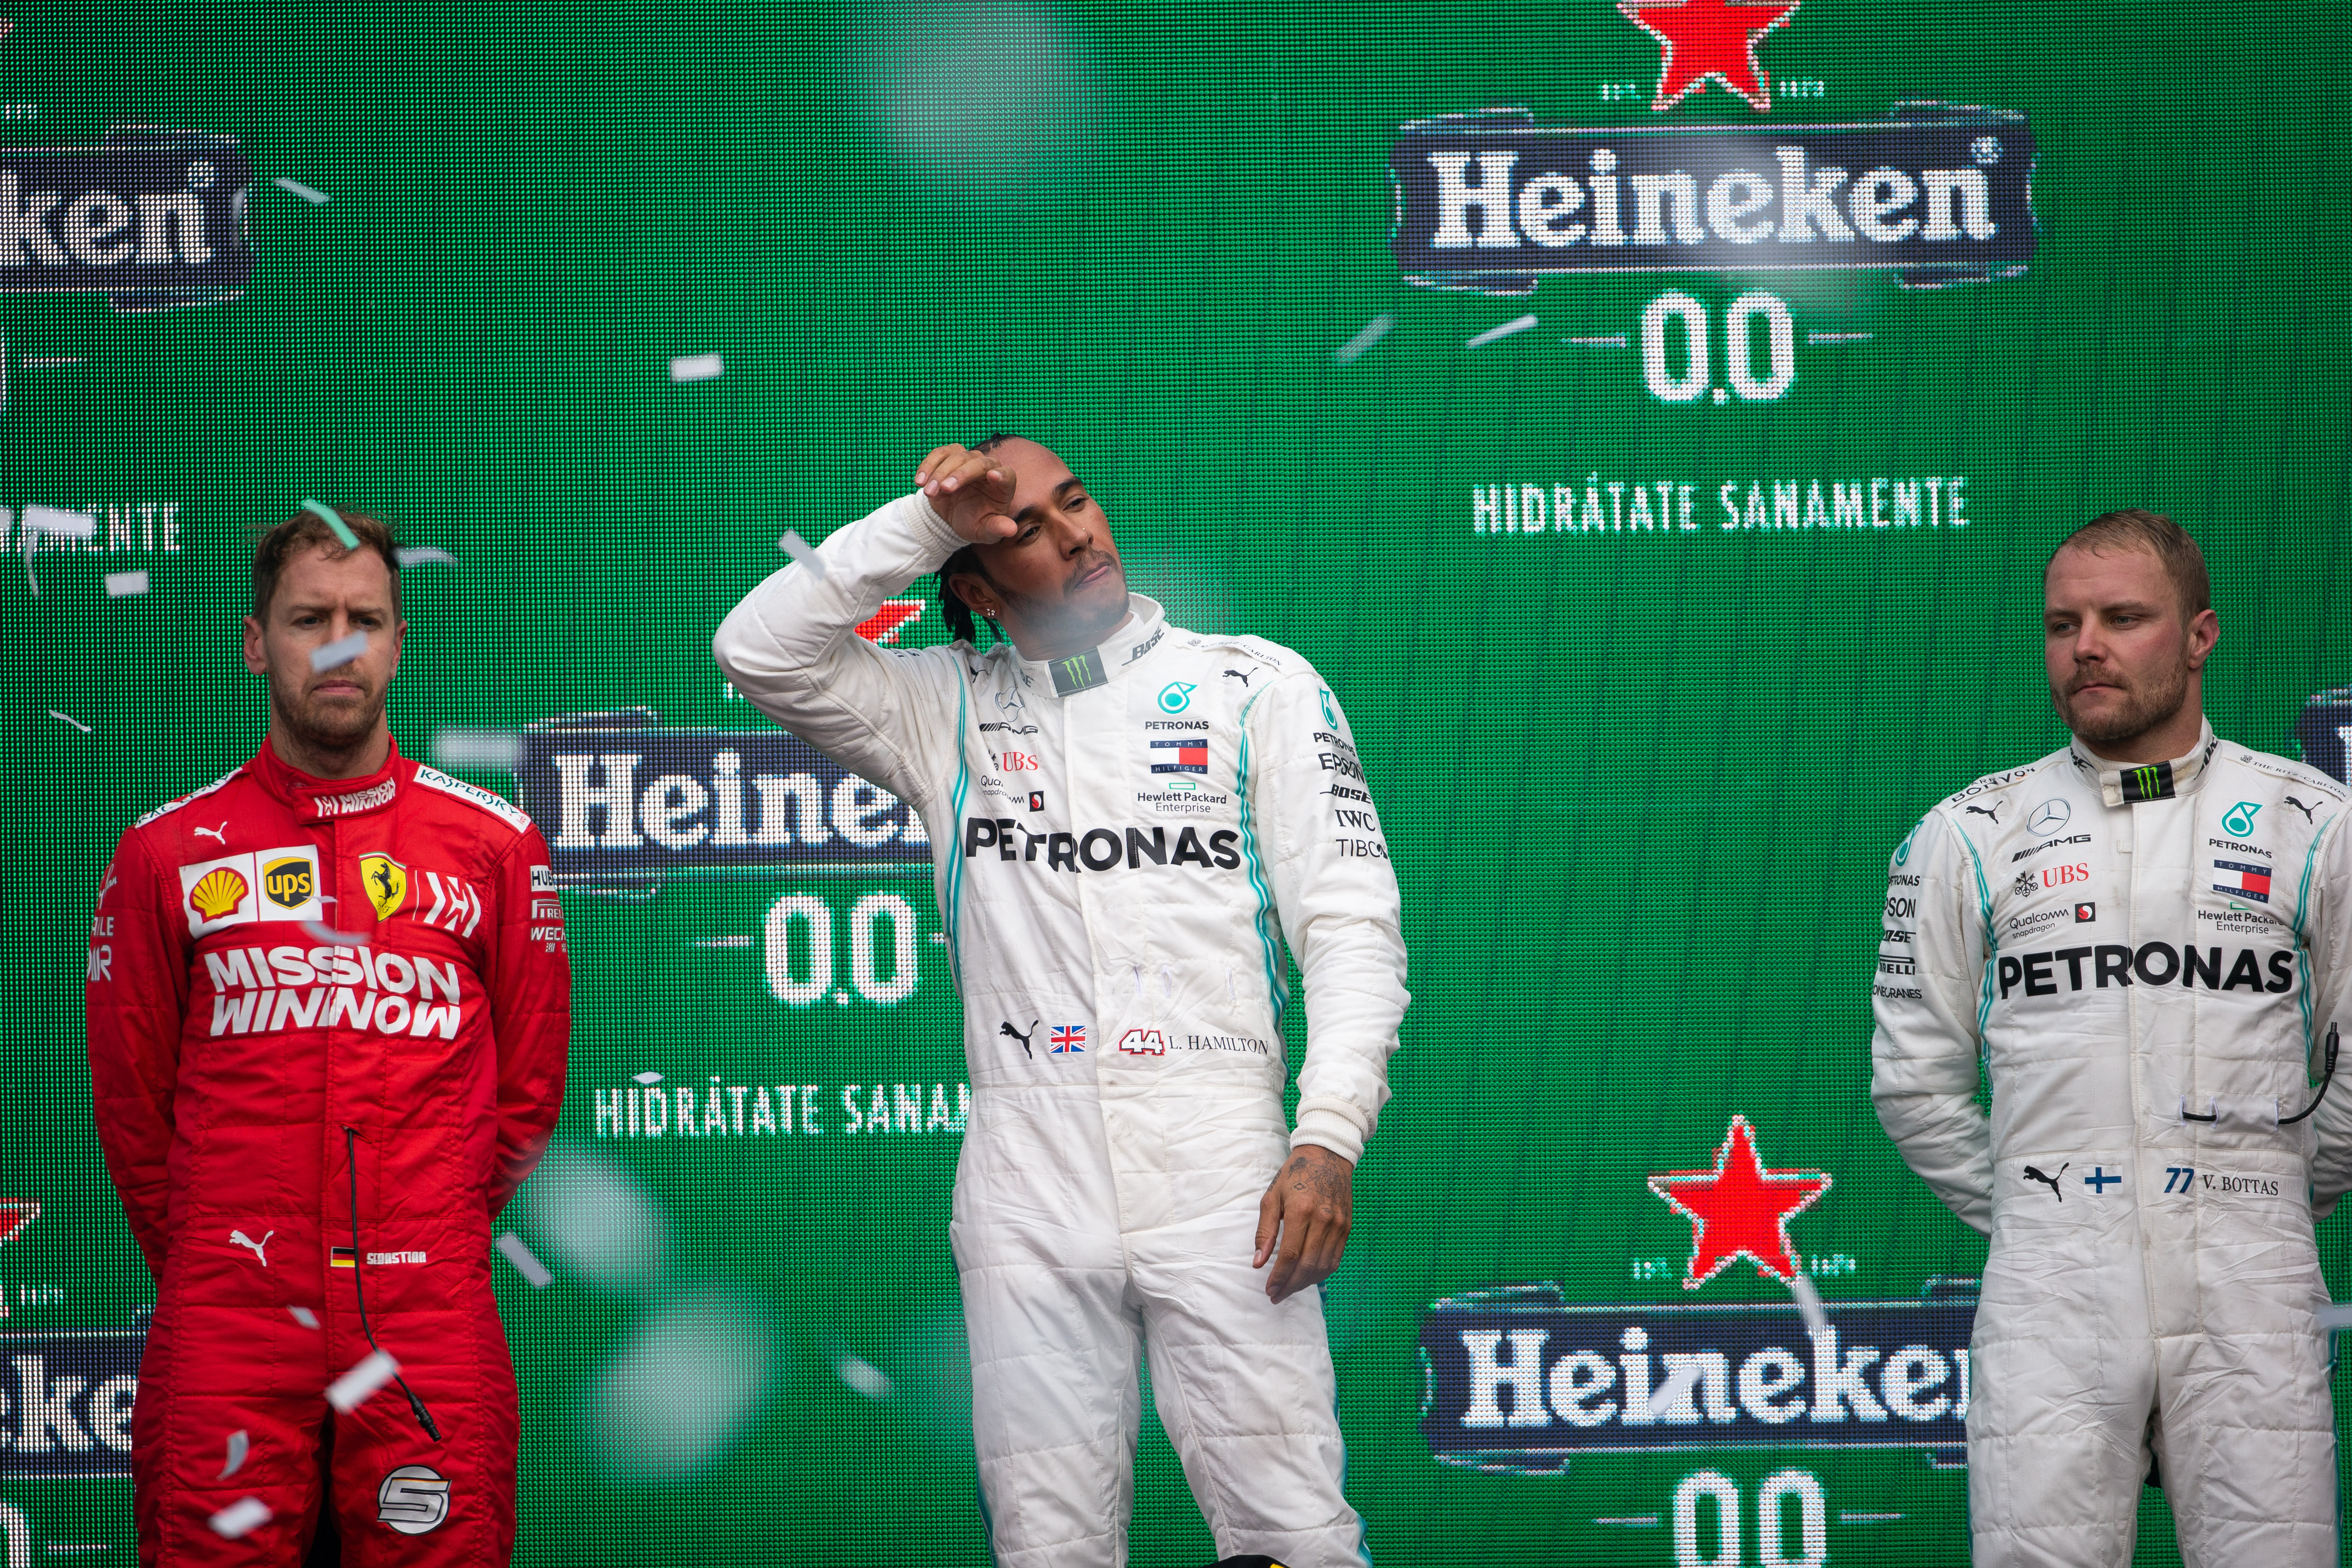 Sebastian Vettel Lewis Hamilton Valtteri Bottas Mexican Grand Prix podium 2019